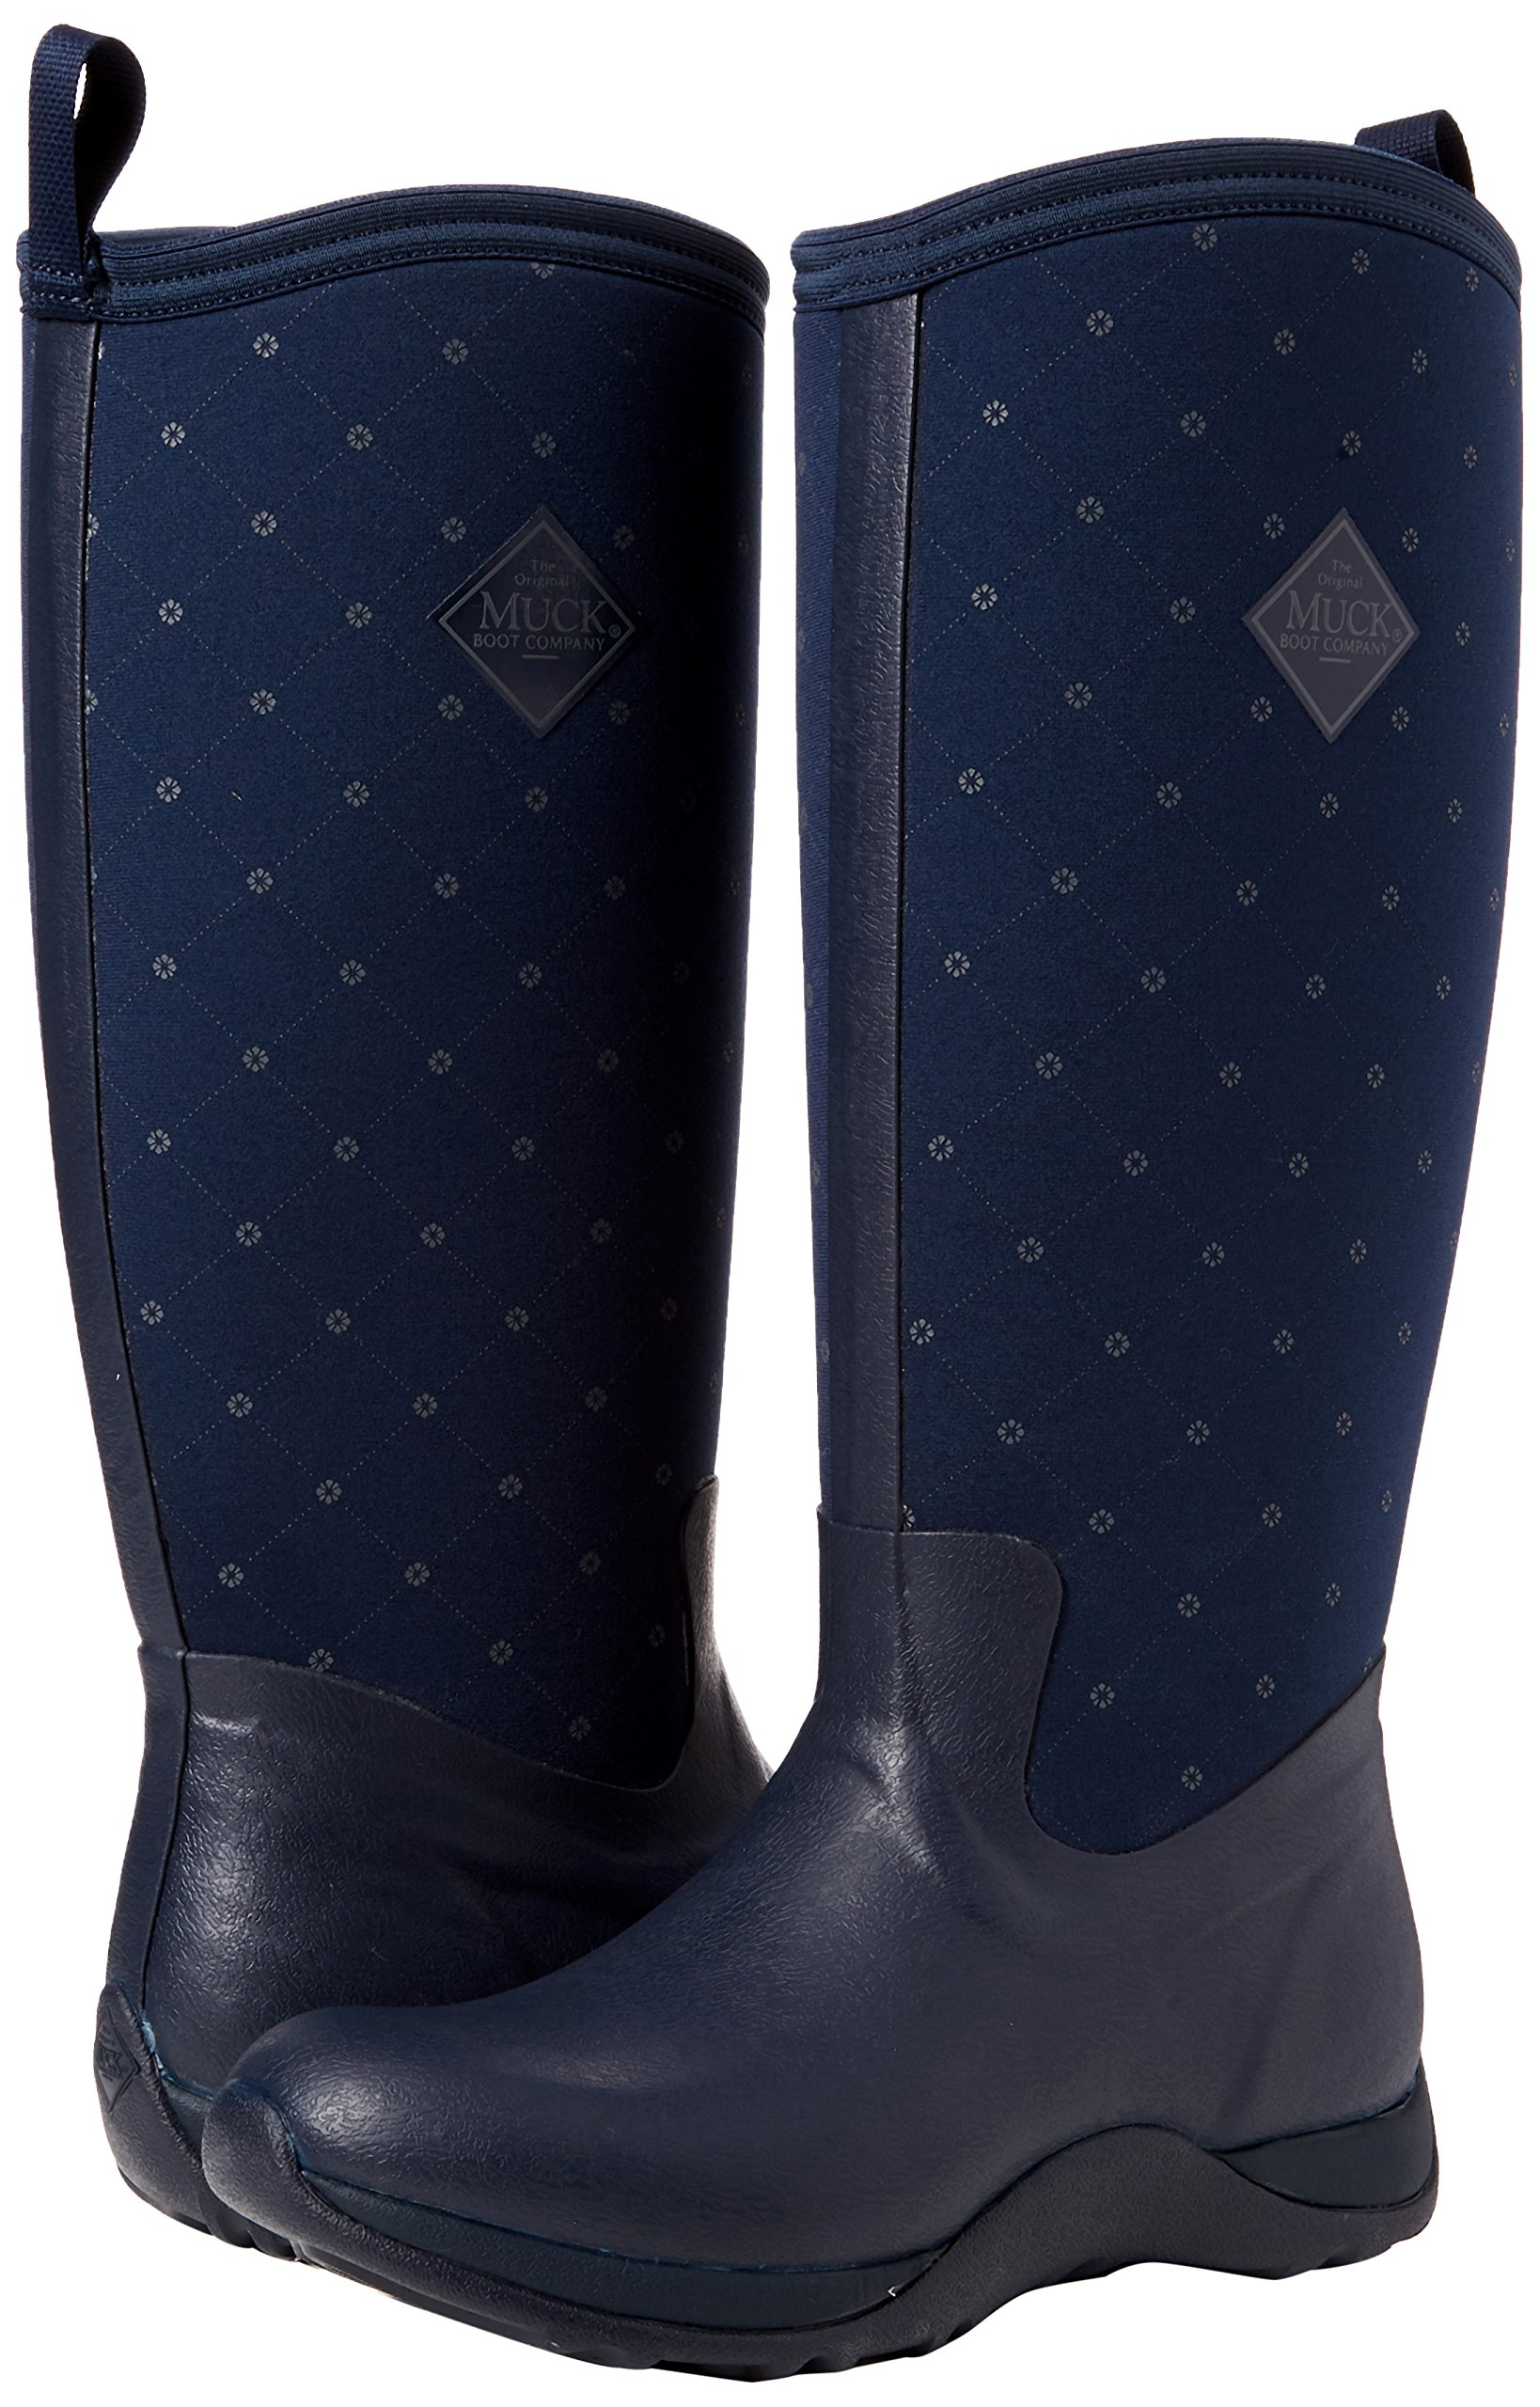 Muck Boots Women's Arctic Adventure (Quilted Print) Wellington Boots 5